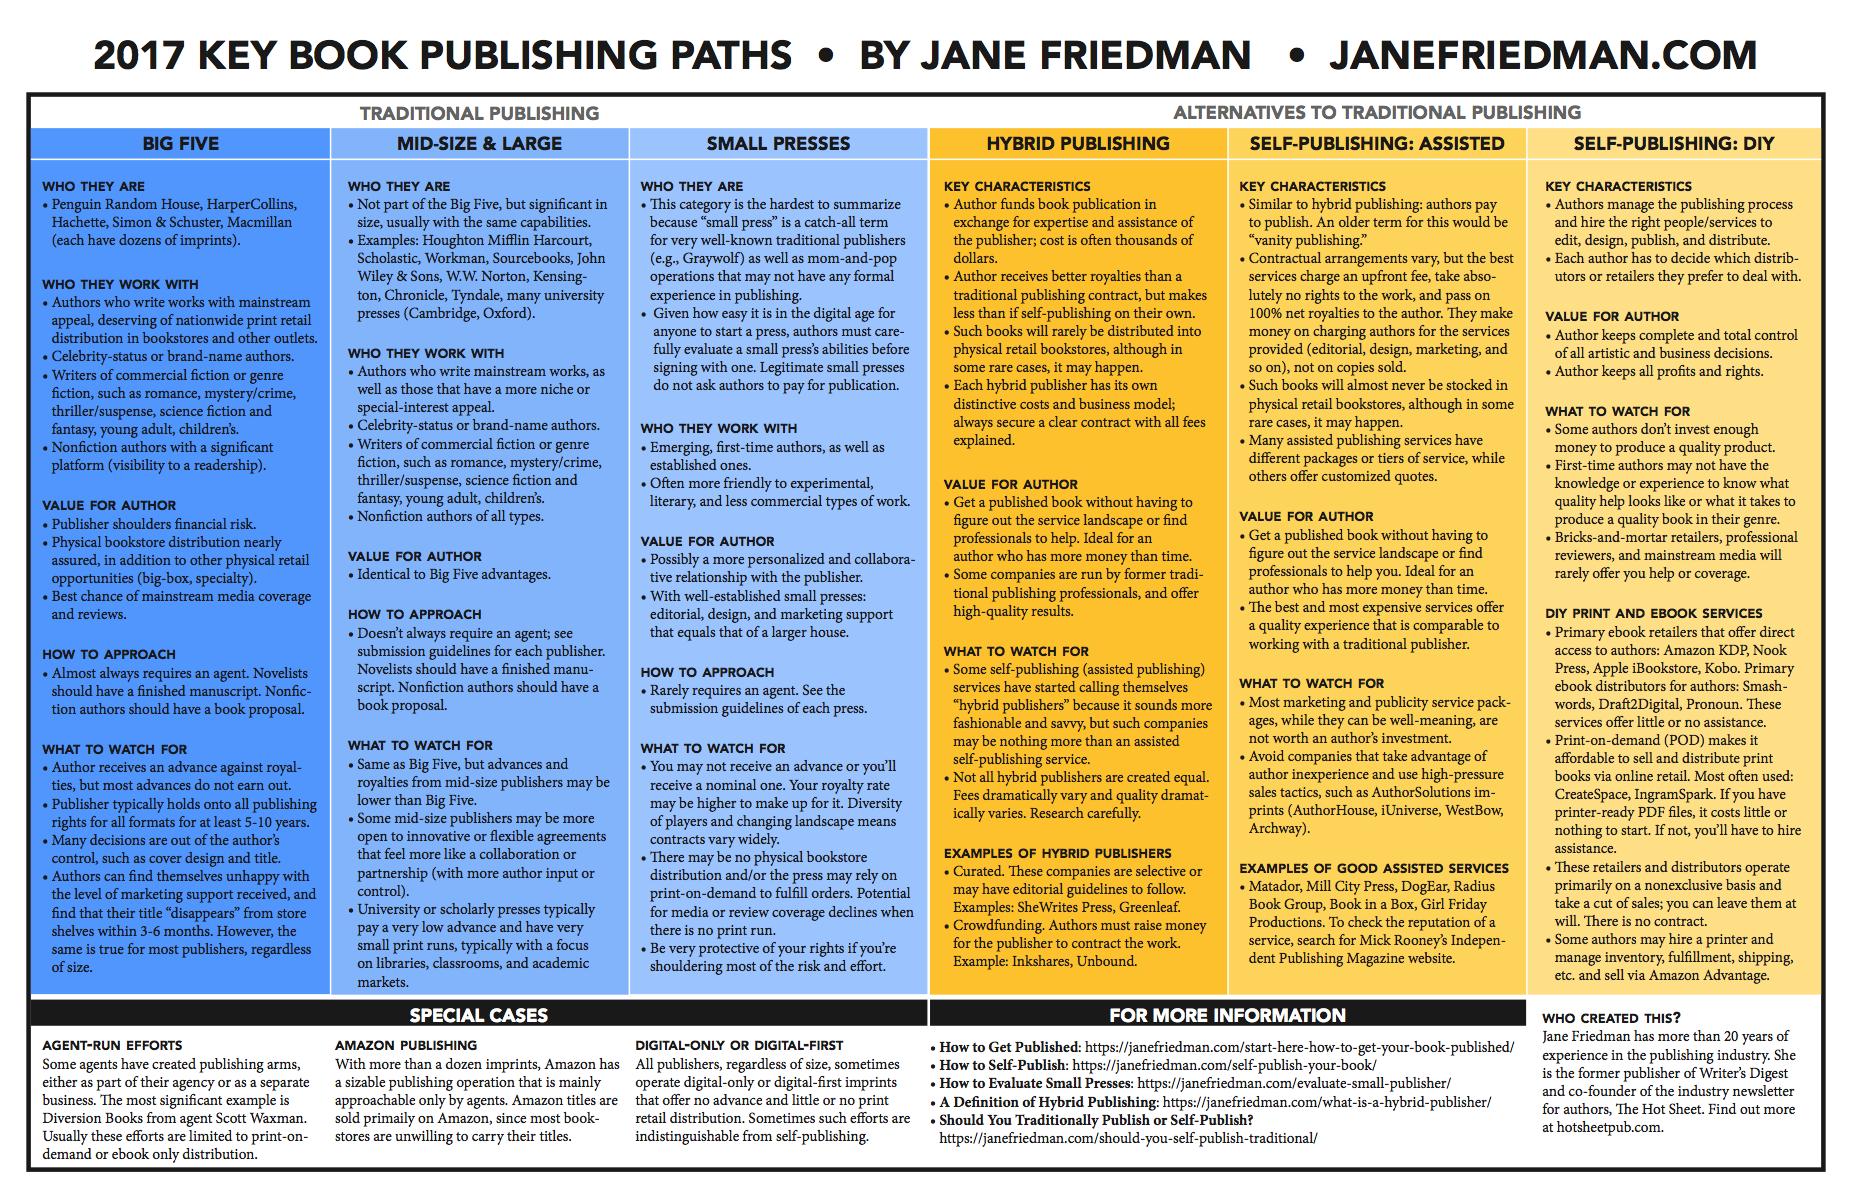 Elegant Jane Friedman